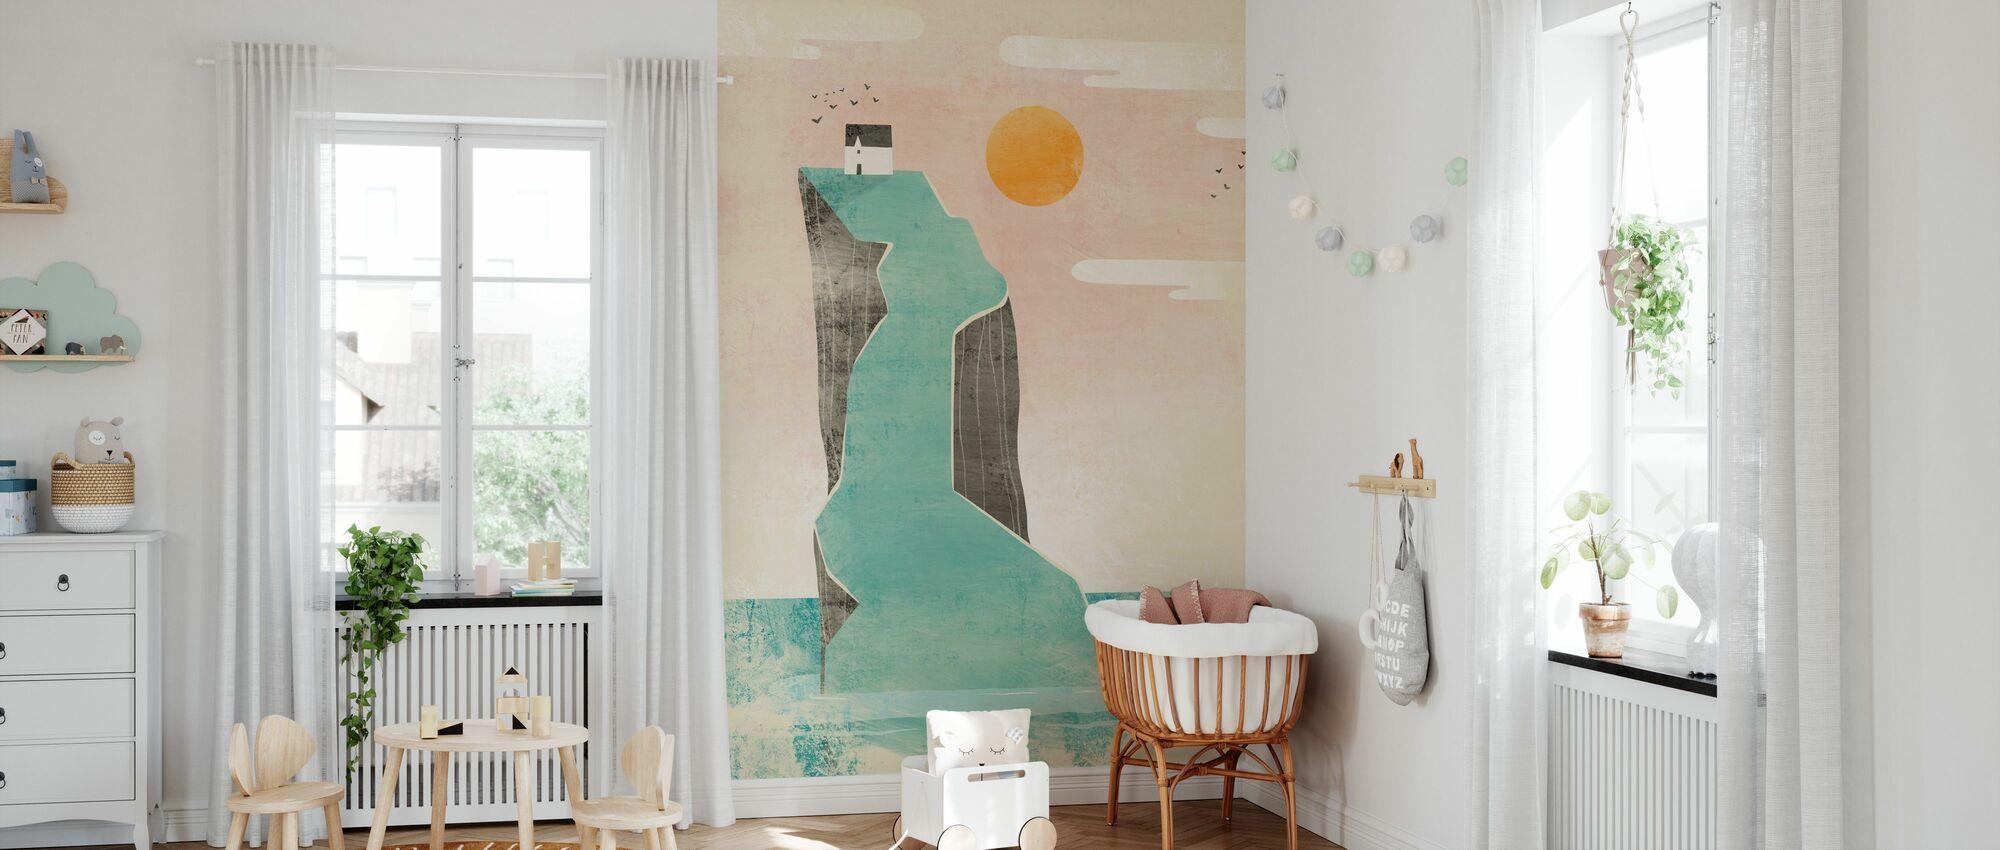 House on the Foggy Hill - Wallpaper - Nursery